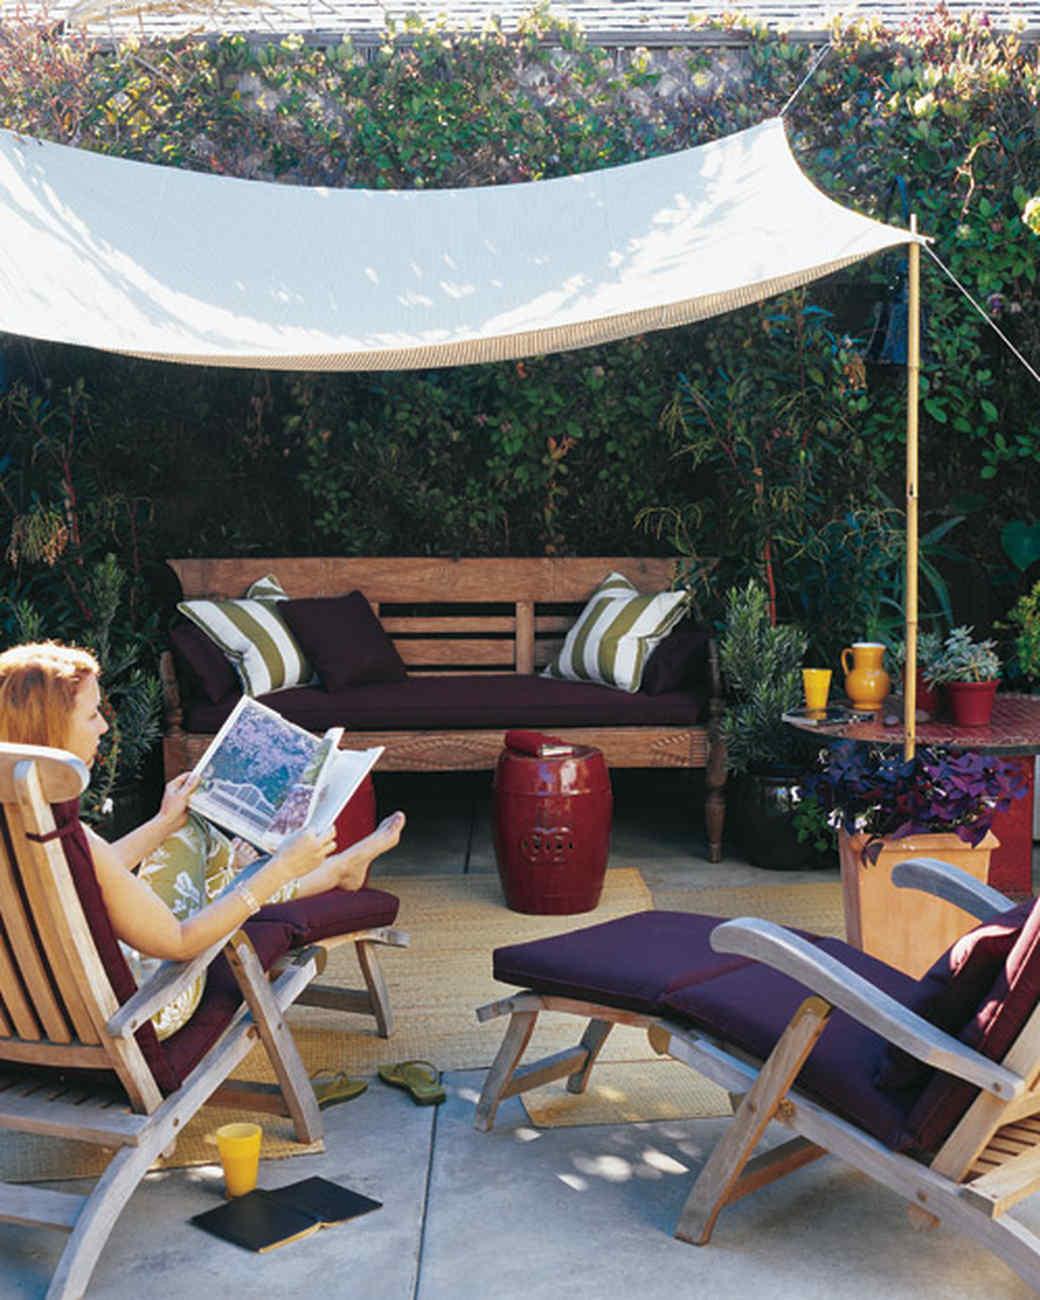 DIY Outdoor Shade  A Slice of Shade Creating Canopies